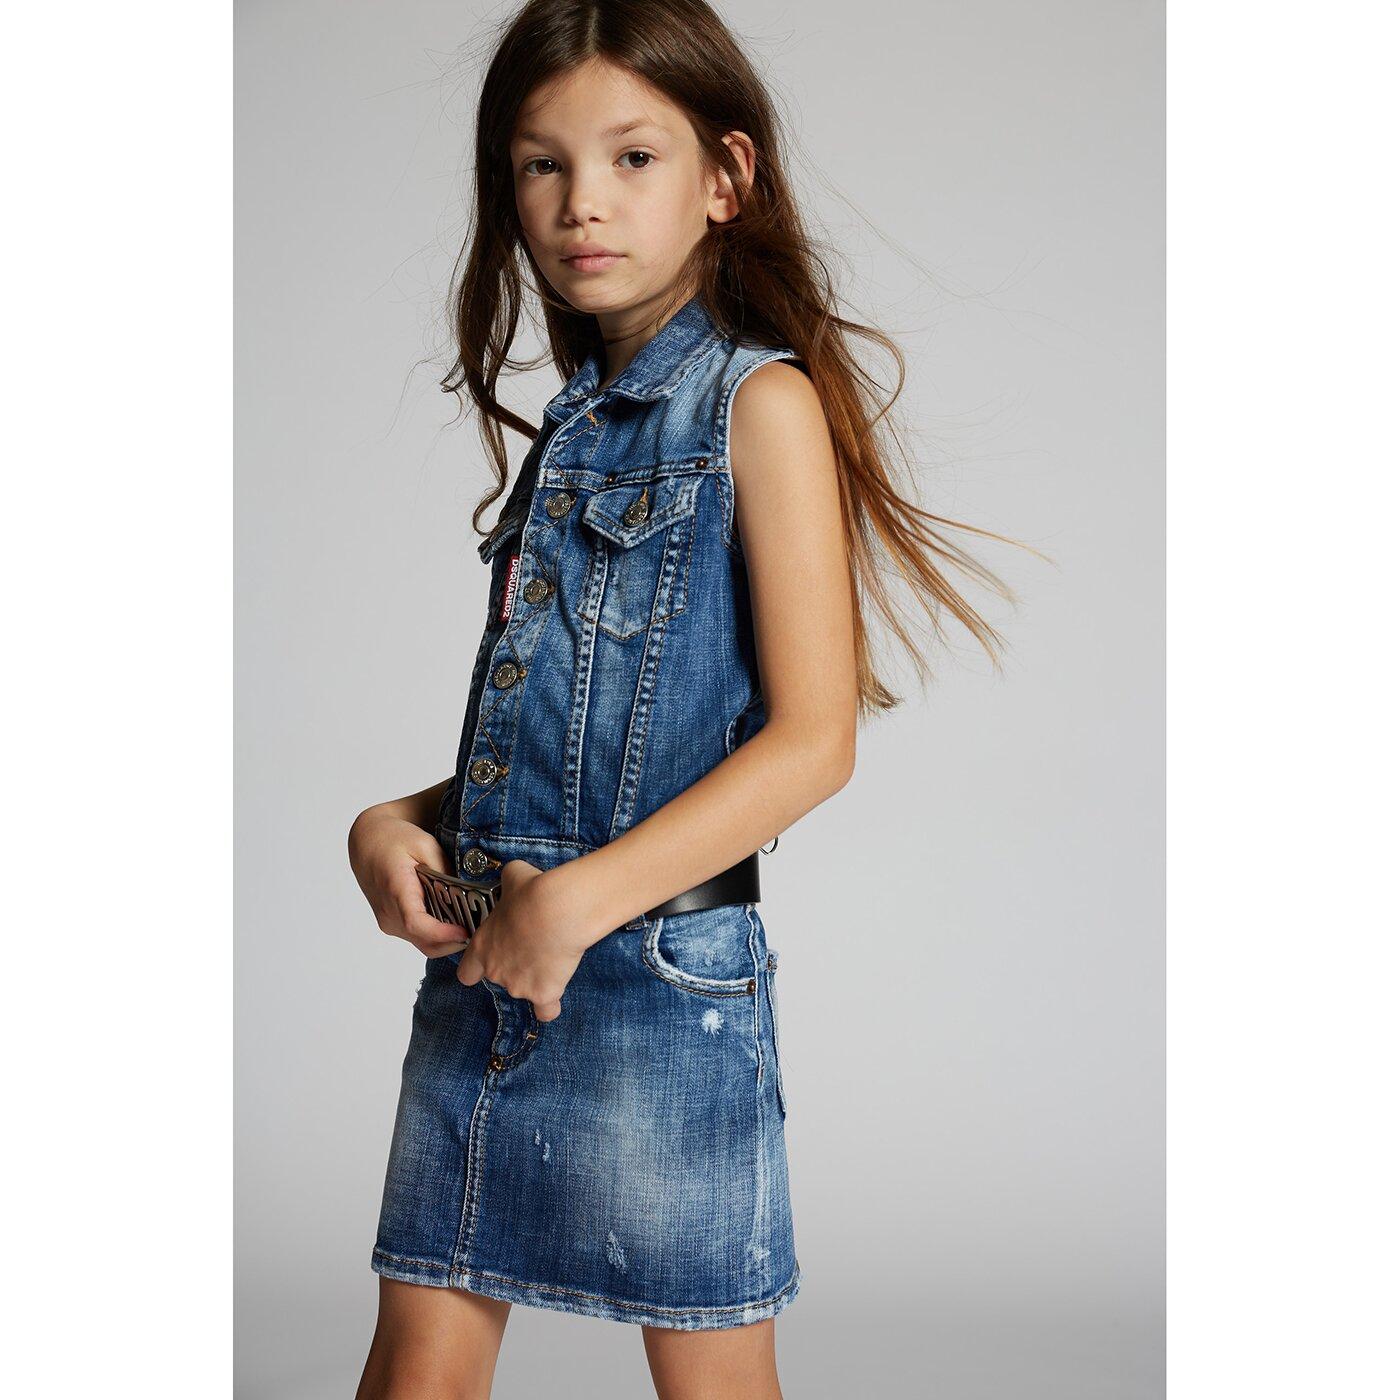 Dsquared2 DQ0091 Jeans Jurkje